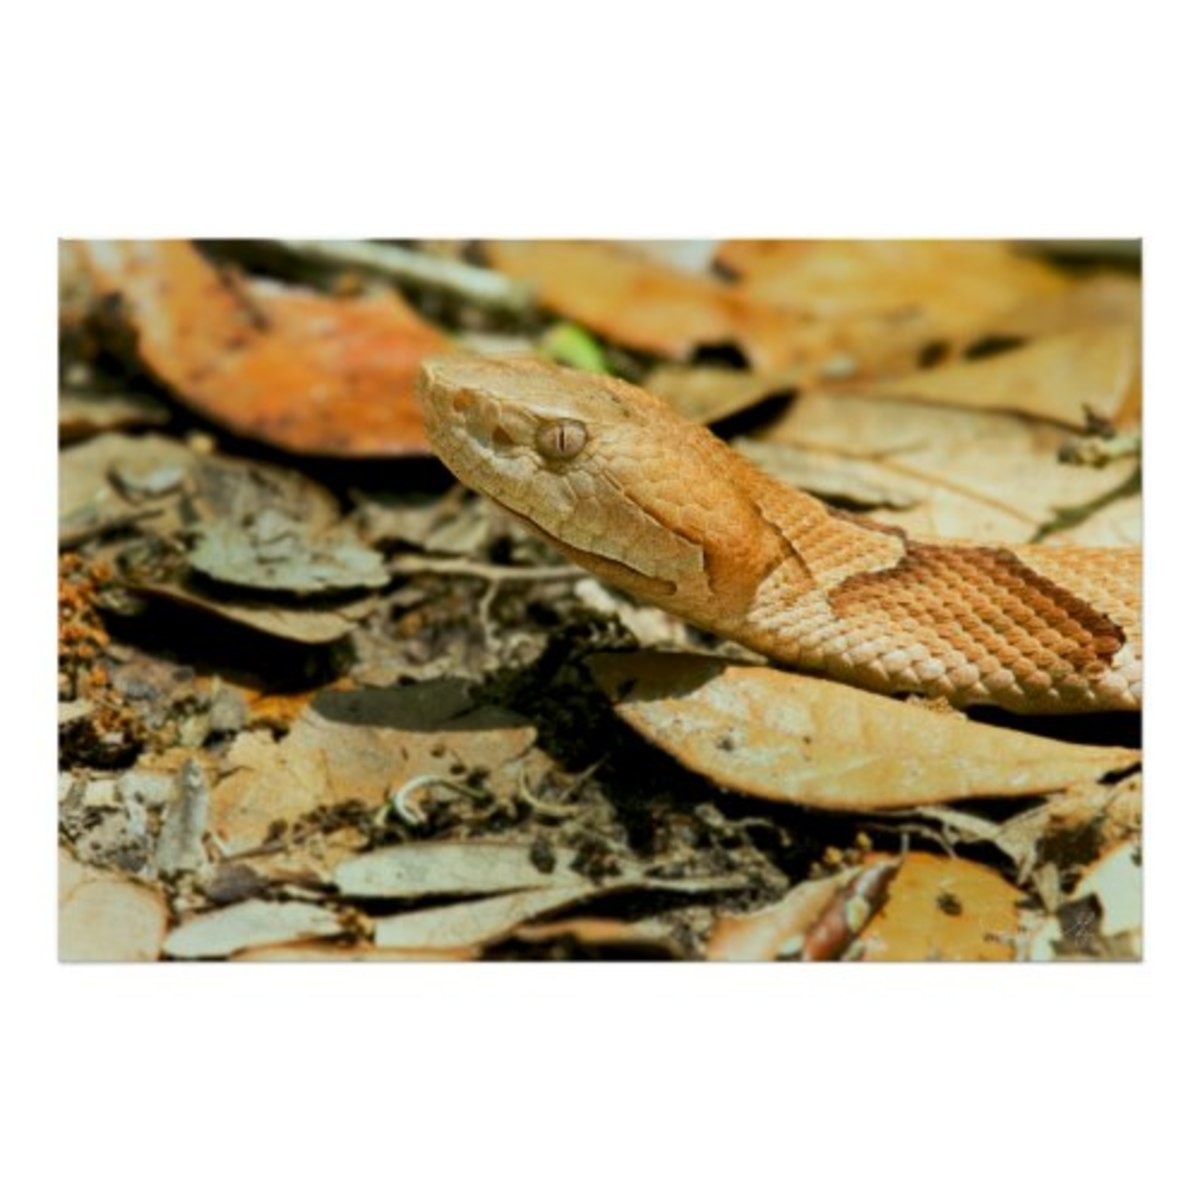 copperhead-snake-louisiana